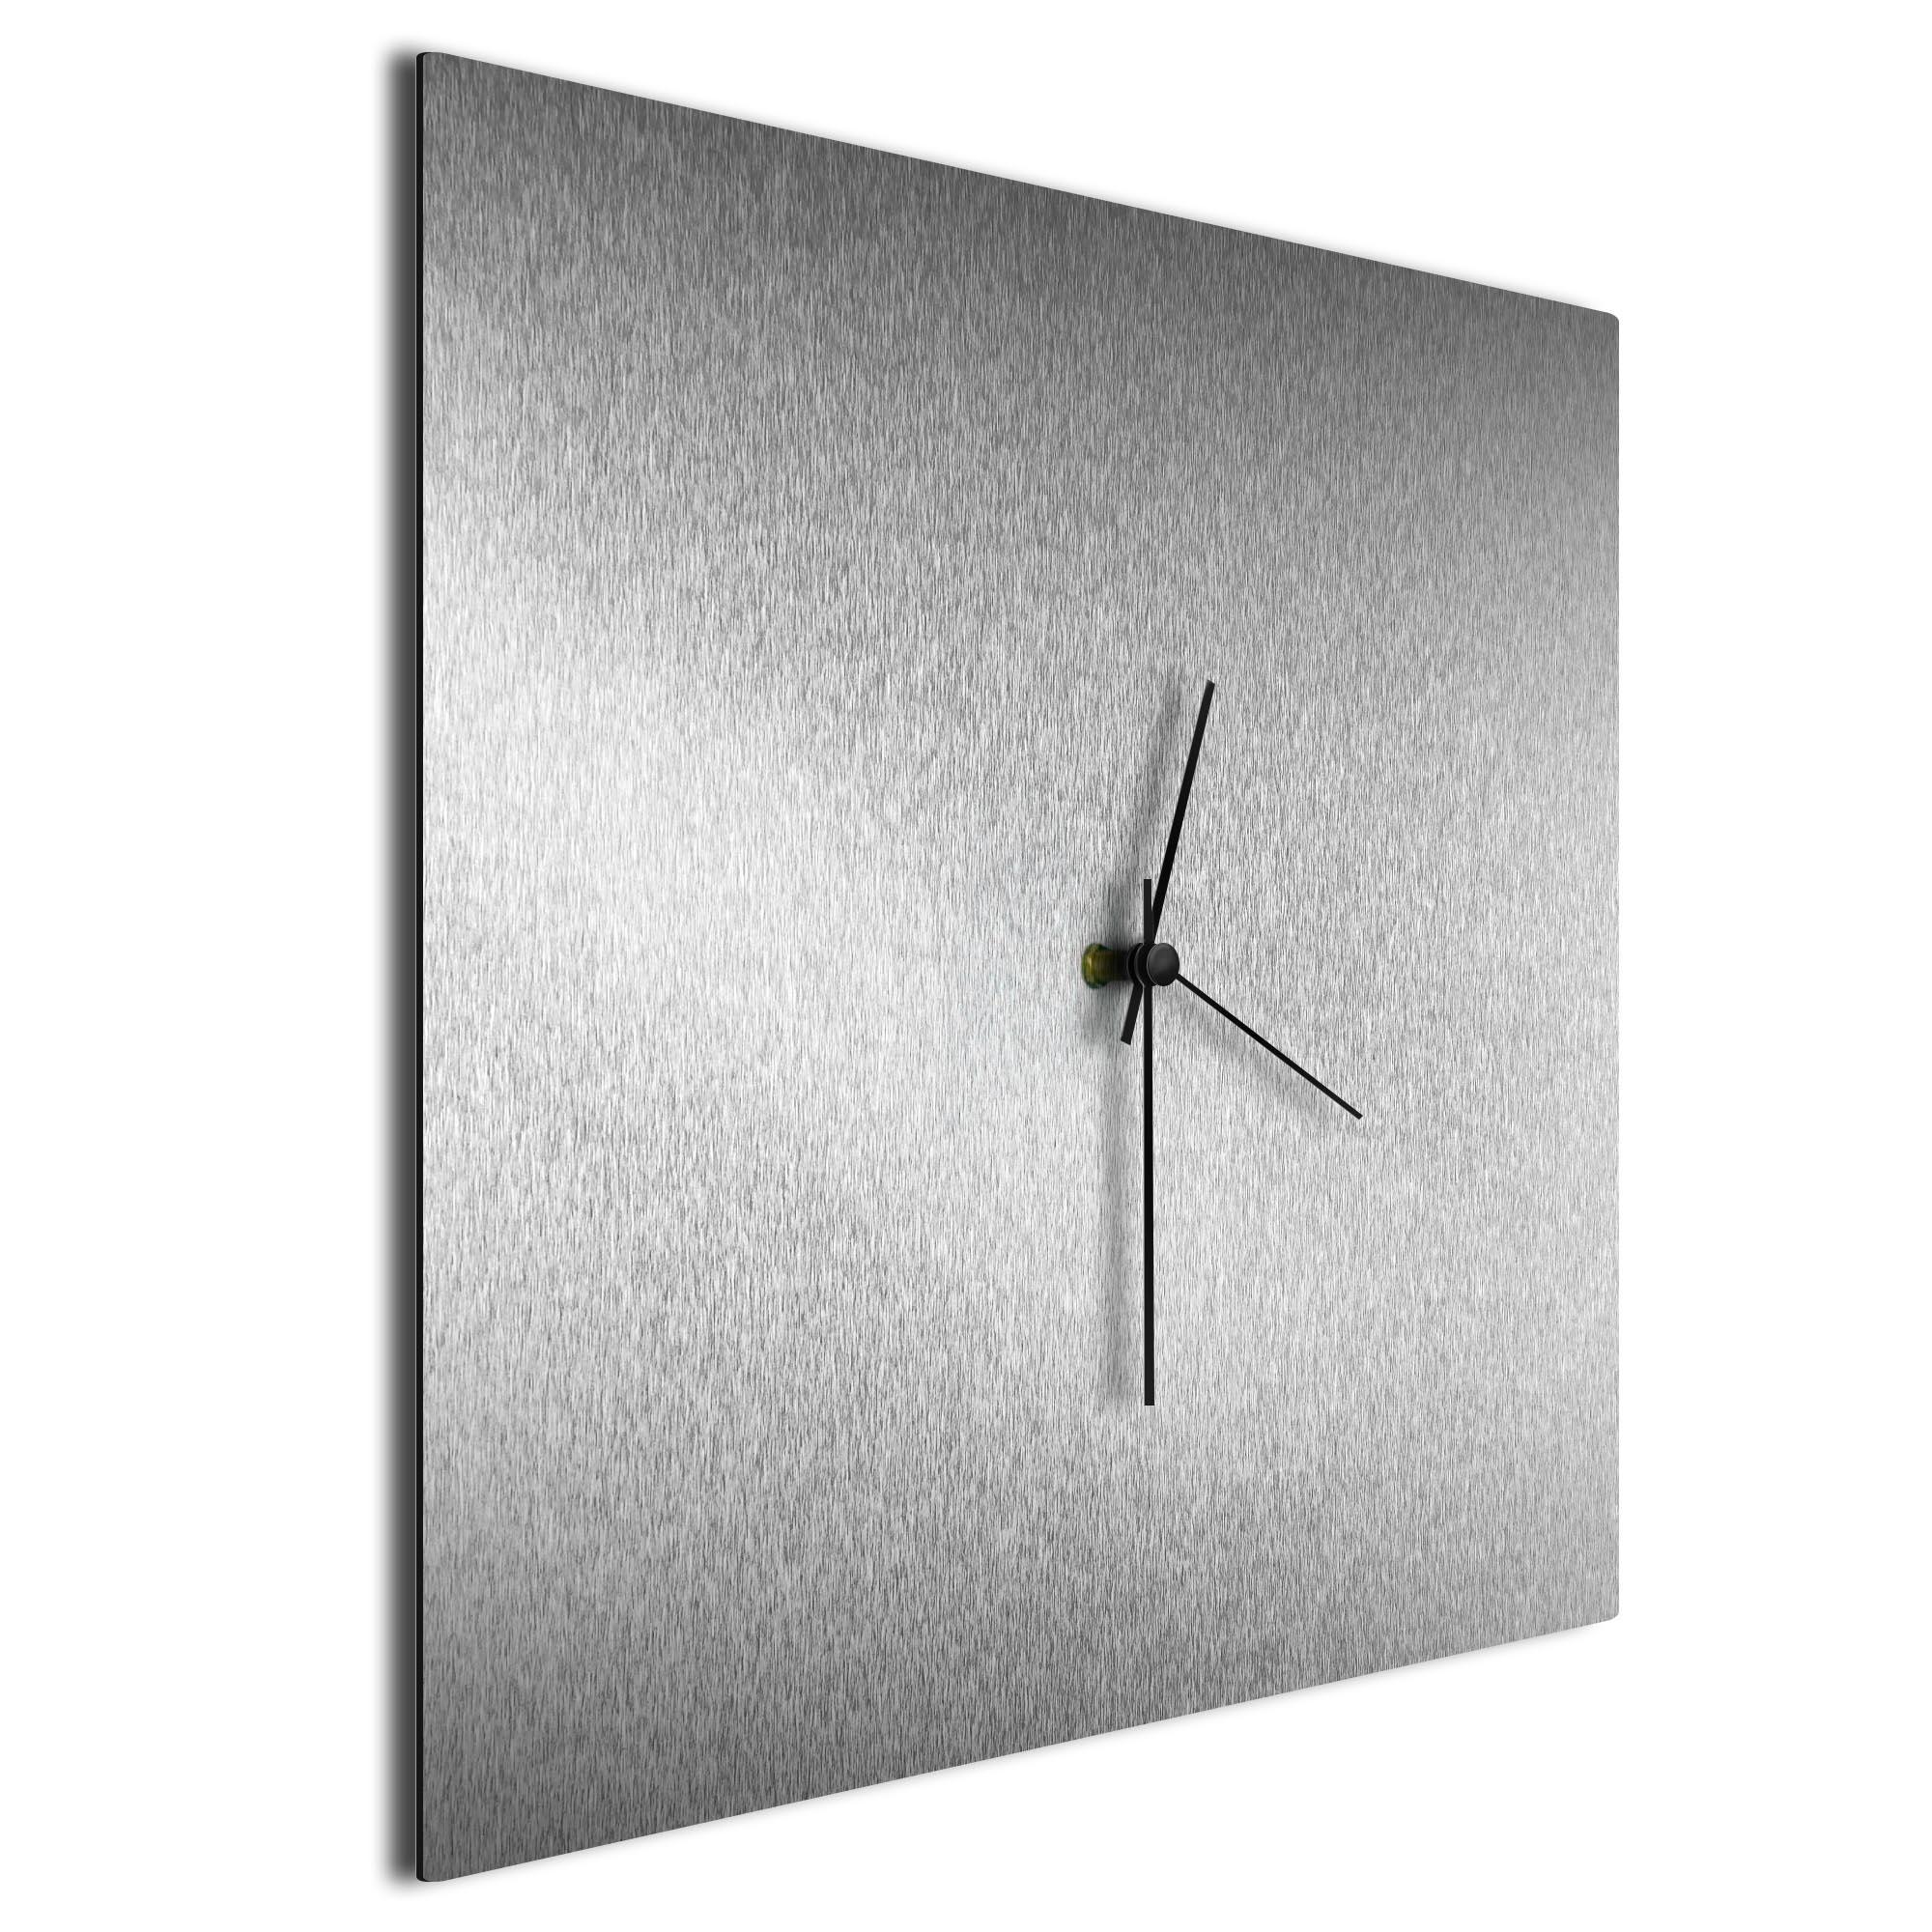 Silversmith Square Clock Black - Image 2